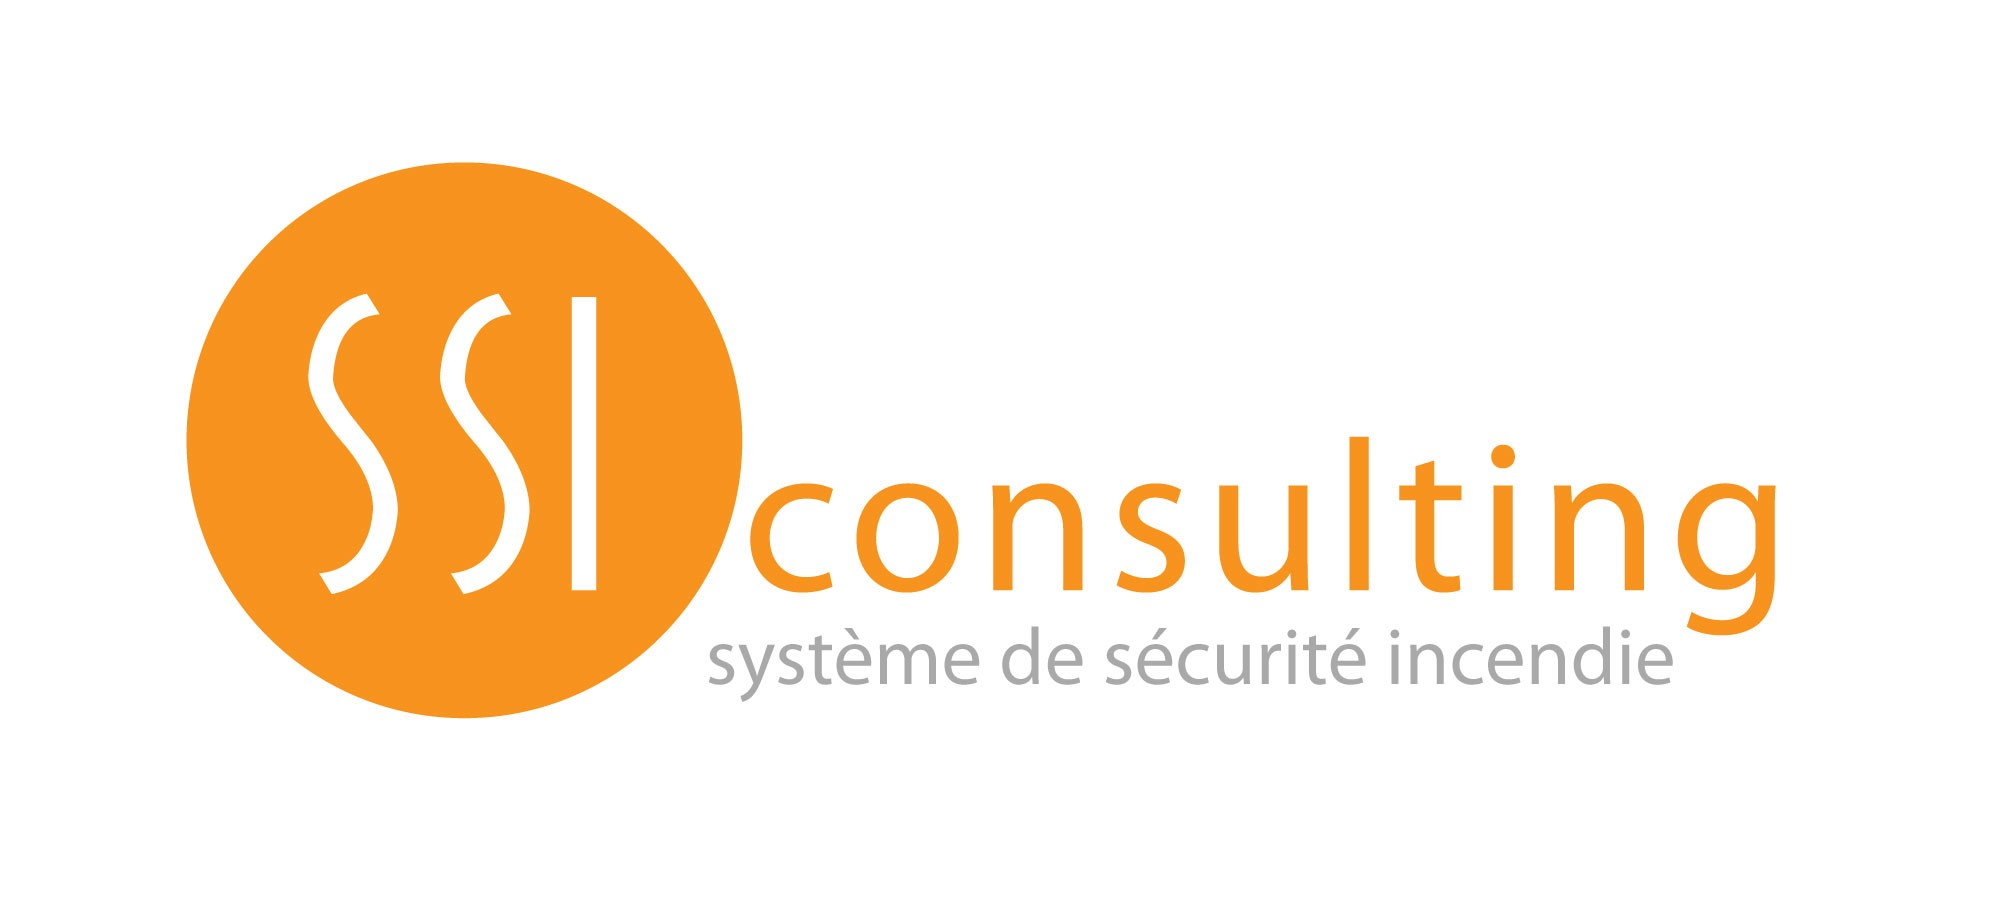 Logo SSI Consulting